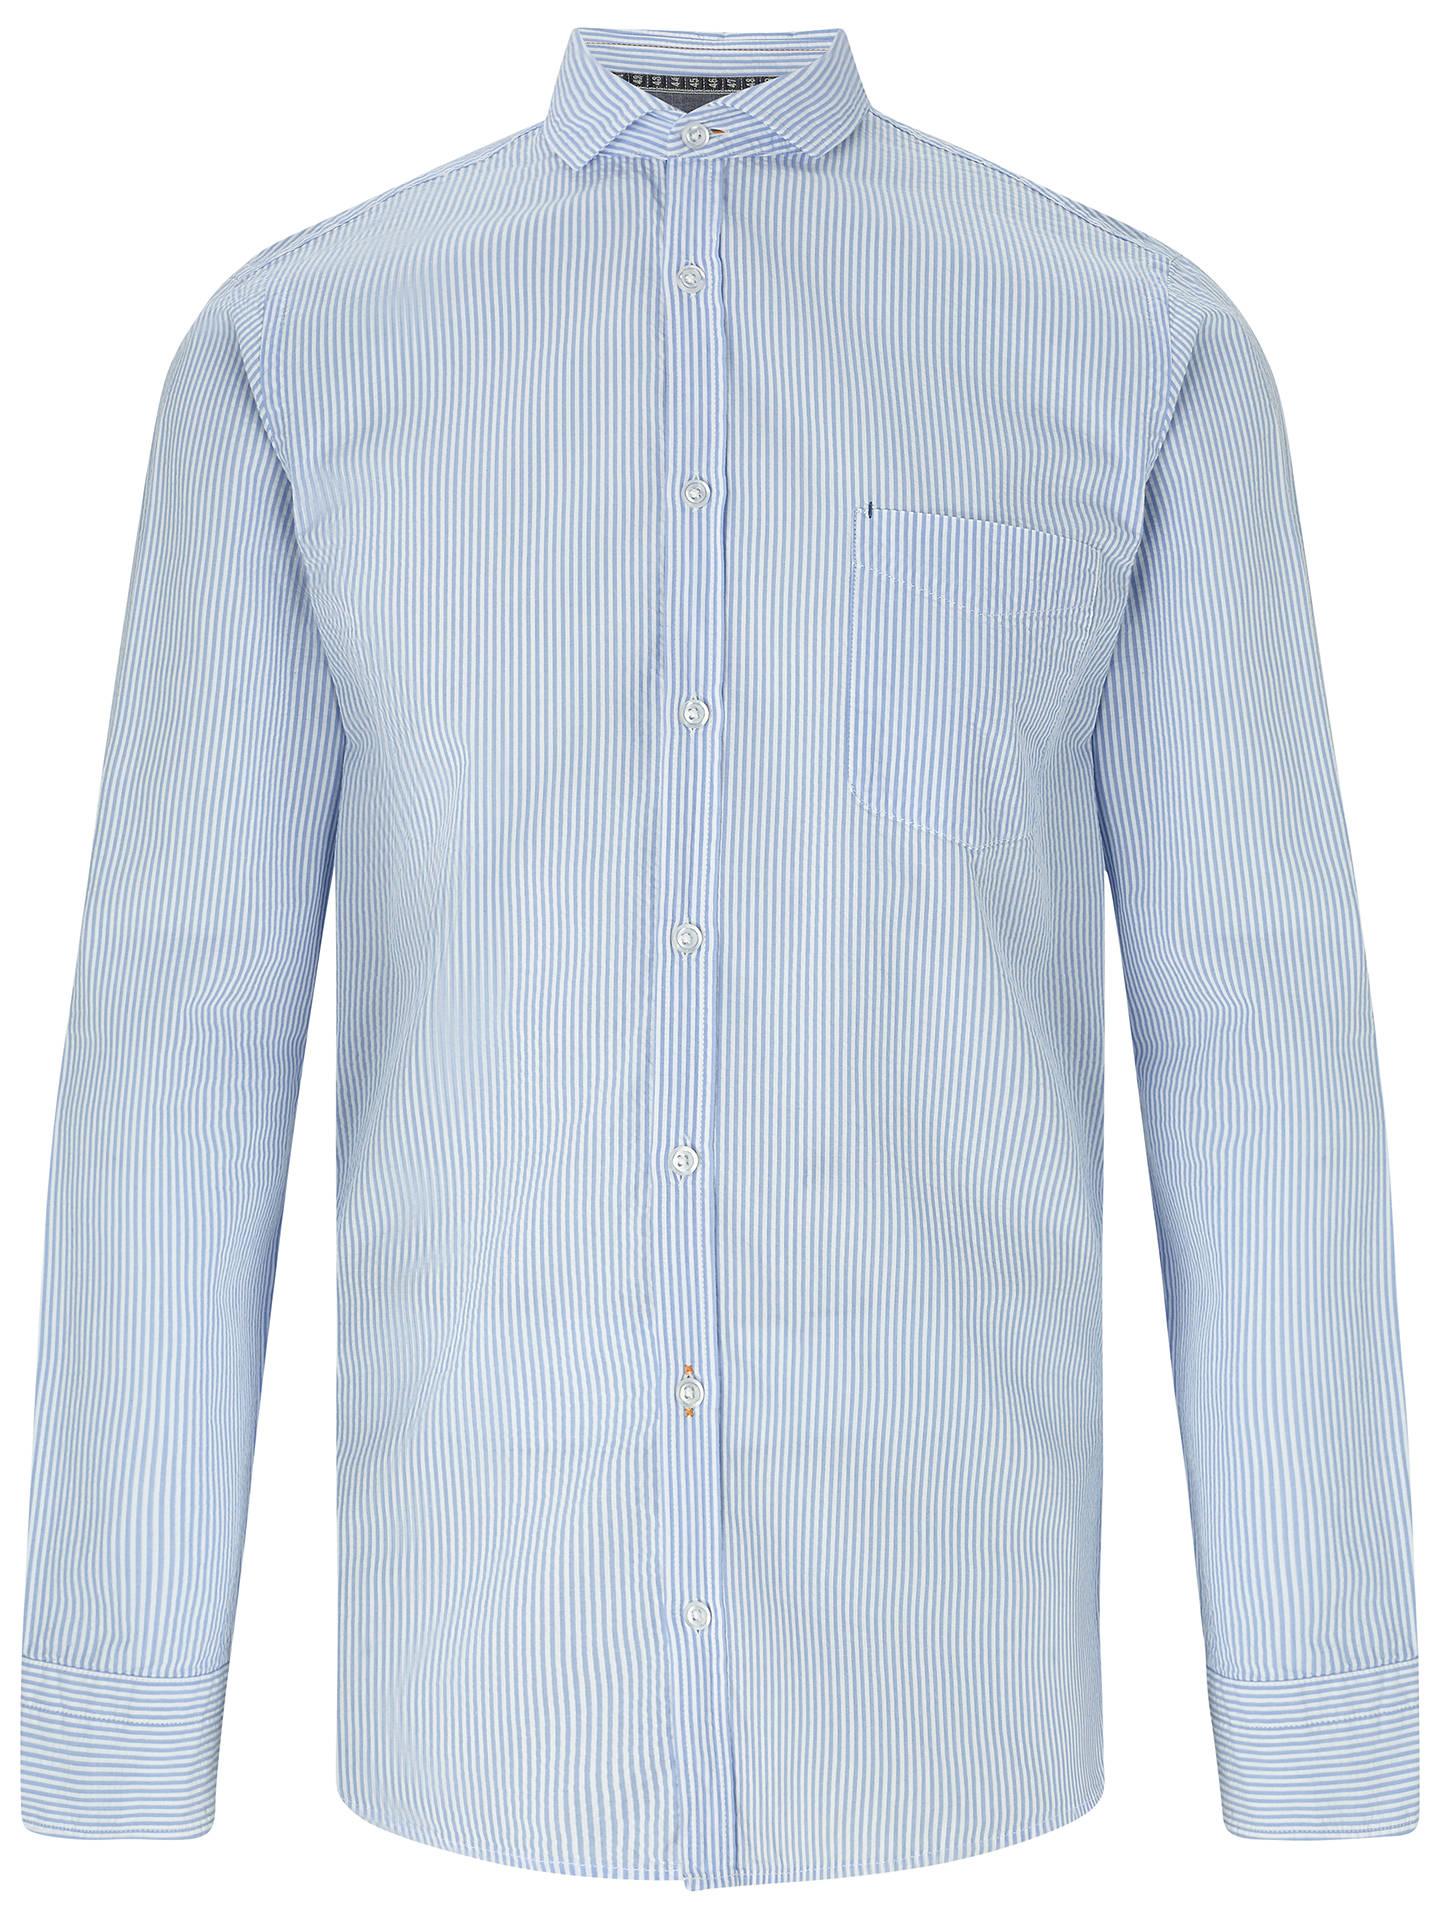 41be38e5b Buy BOSS Orange Cattitude Seersucker Stripe Slim Fit Shirt, Open Blue, S  Online at ...